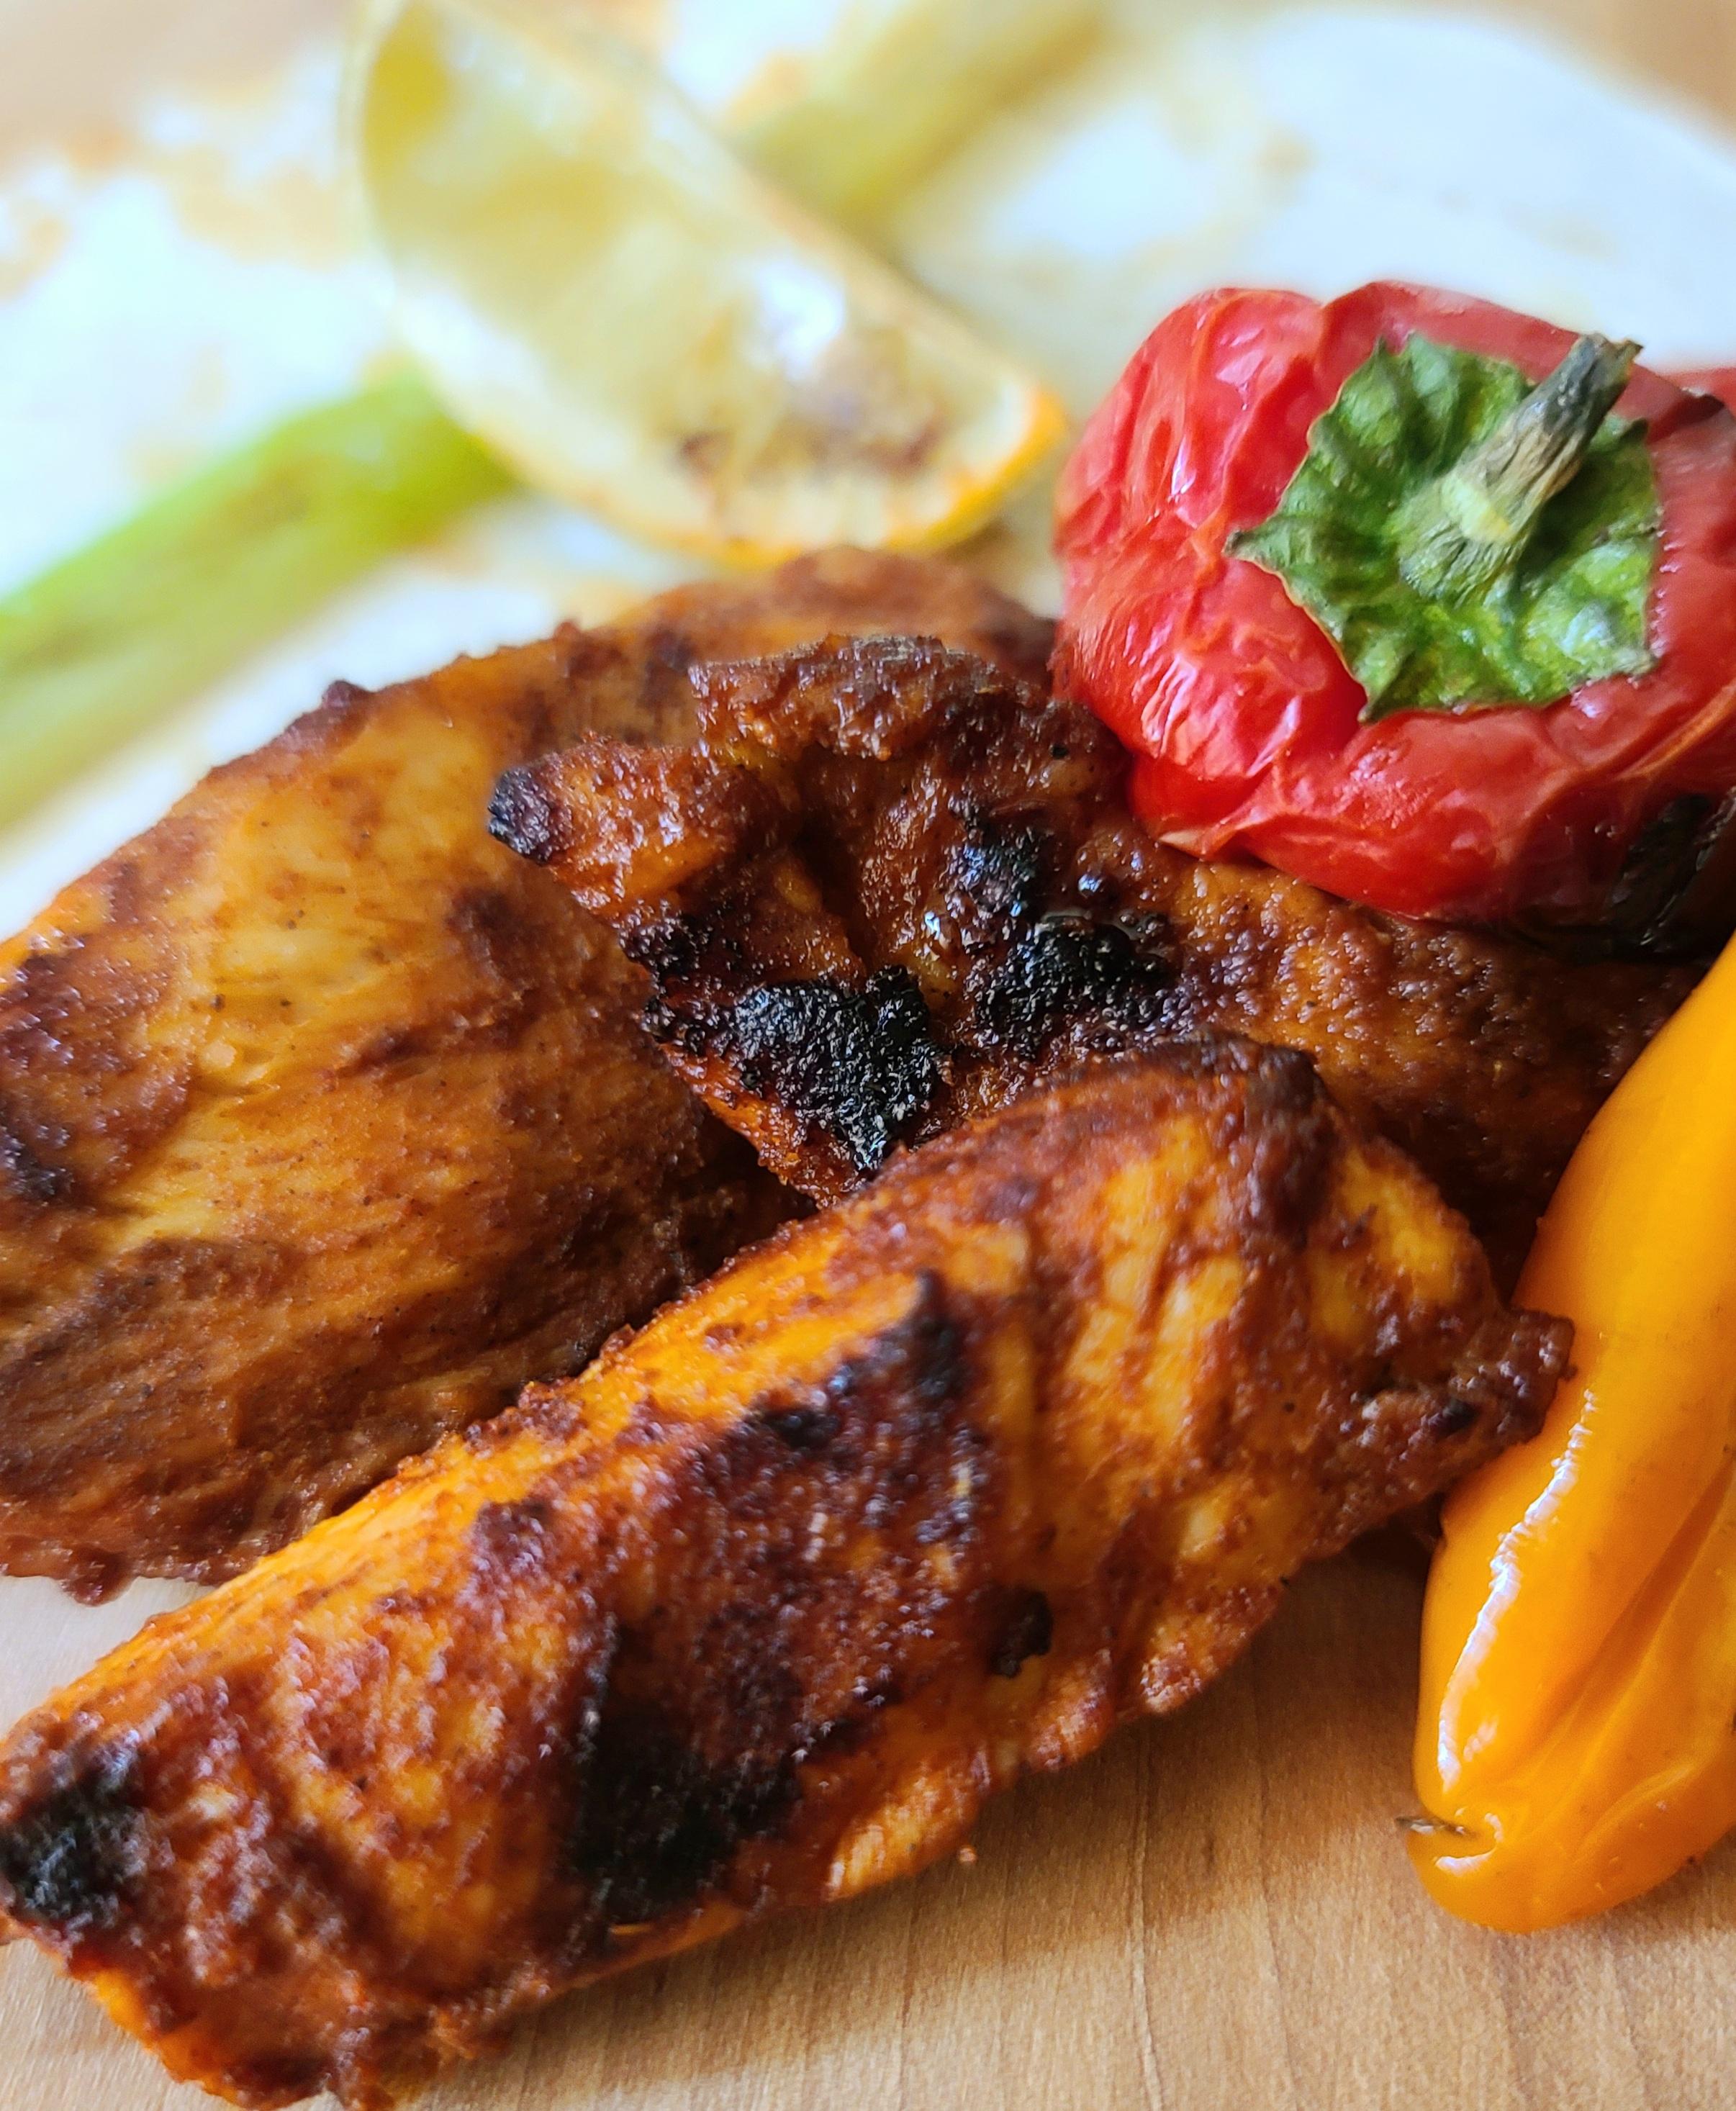 Grilled Chicken Fajitas Nicolette